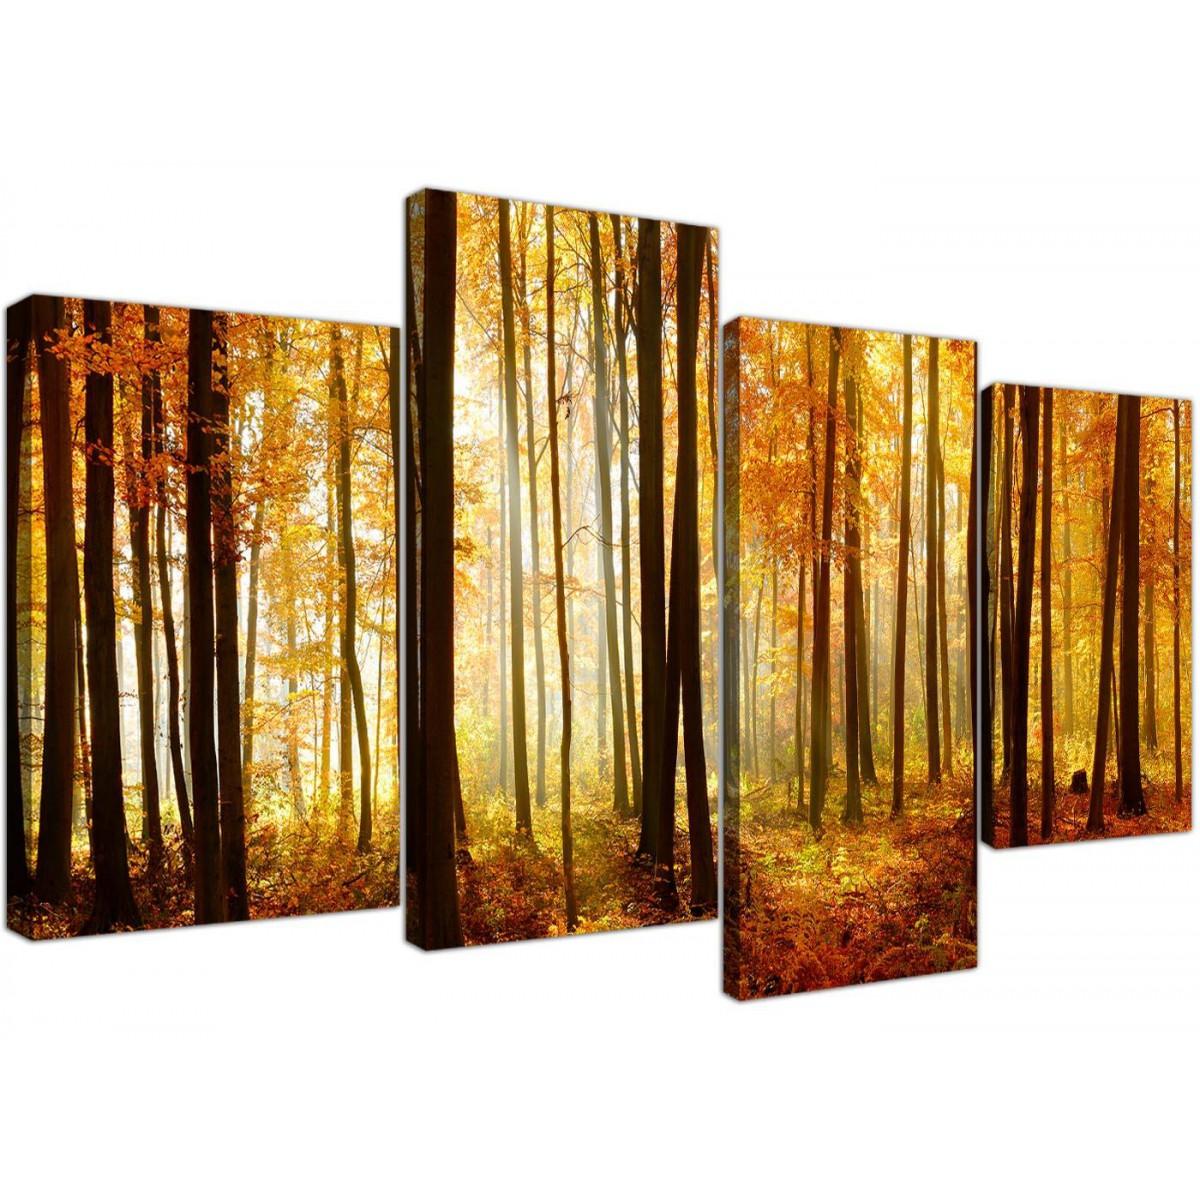 Black & White Orange Forest Trees Canvas Print Wall Art